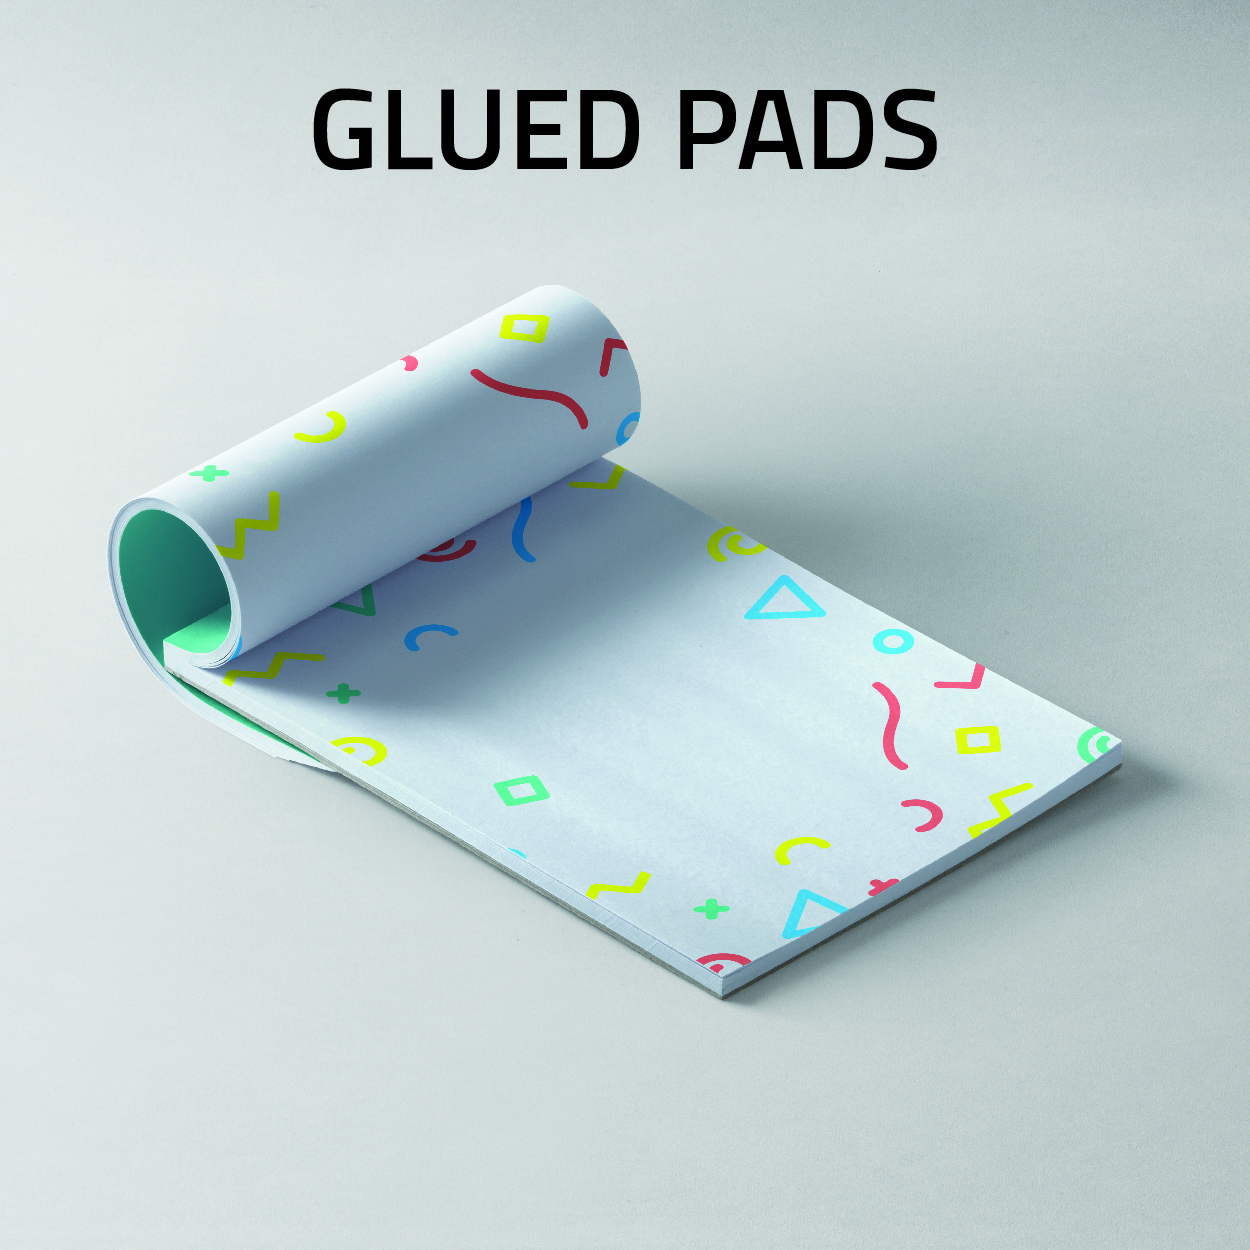 Glued Pads